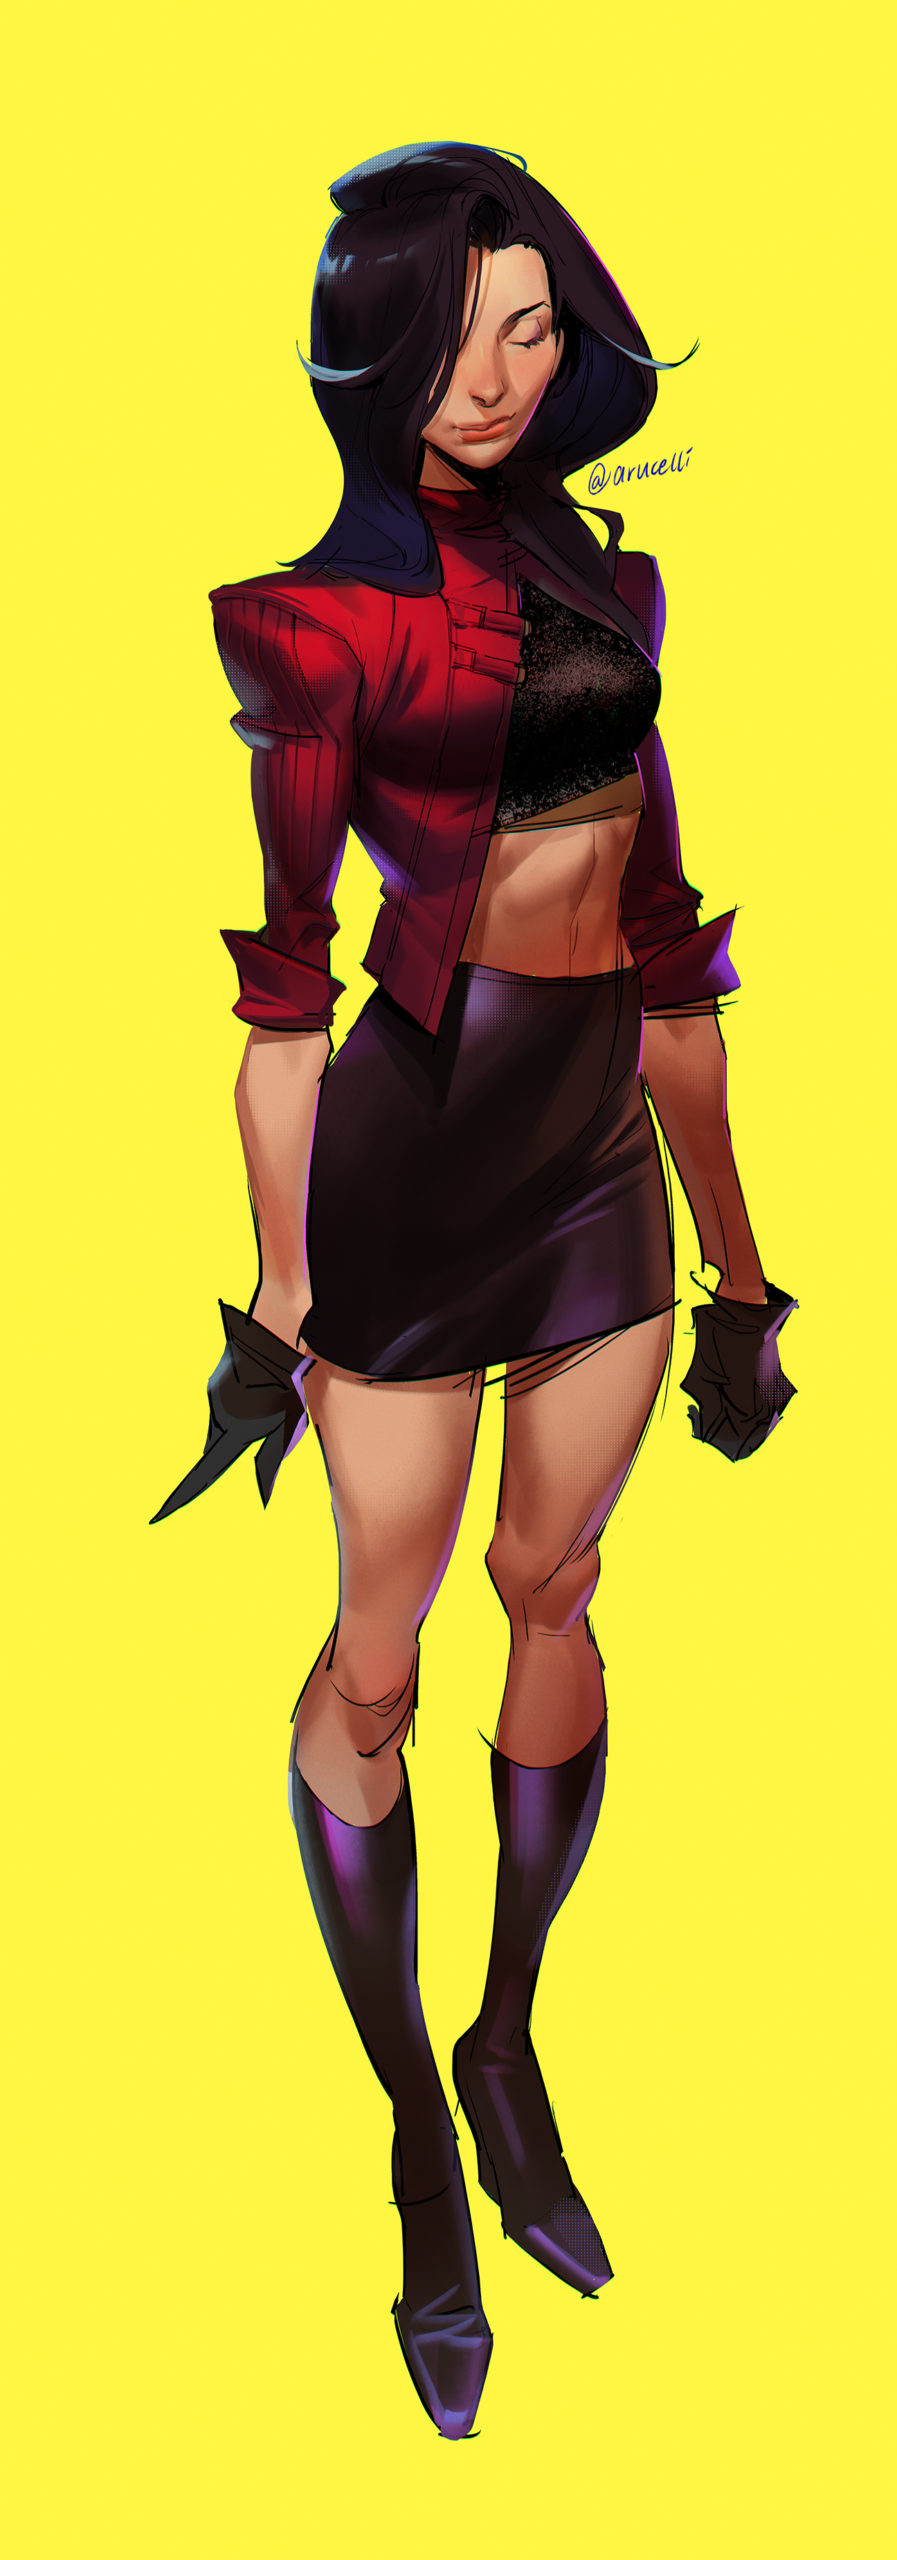 GirlsclubAsia-ConceptArtist-Illustrator- Knight Zhang-stylized girl_neon